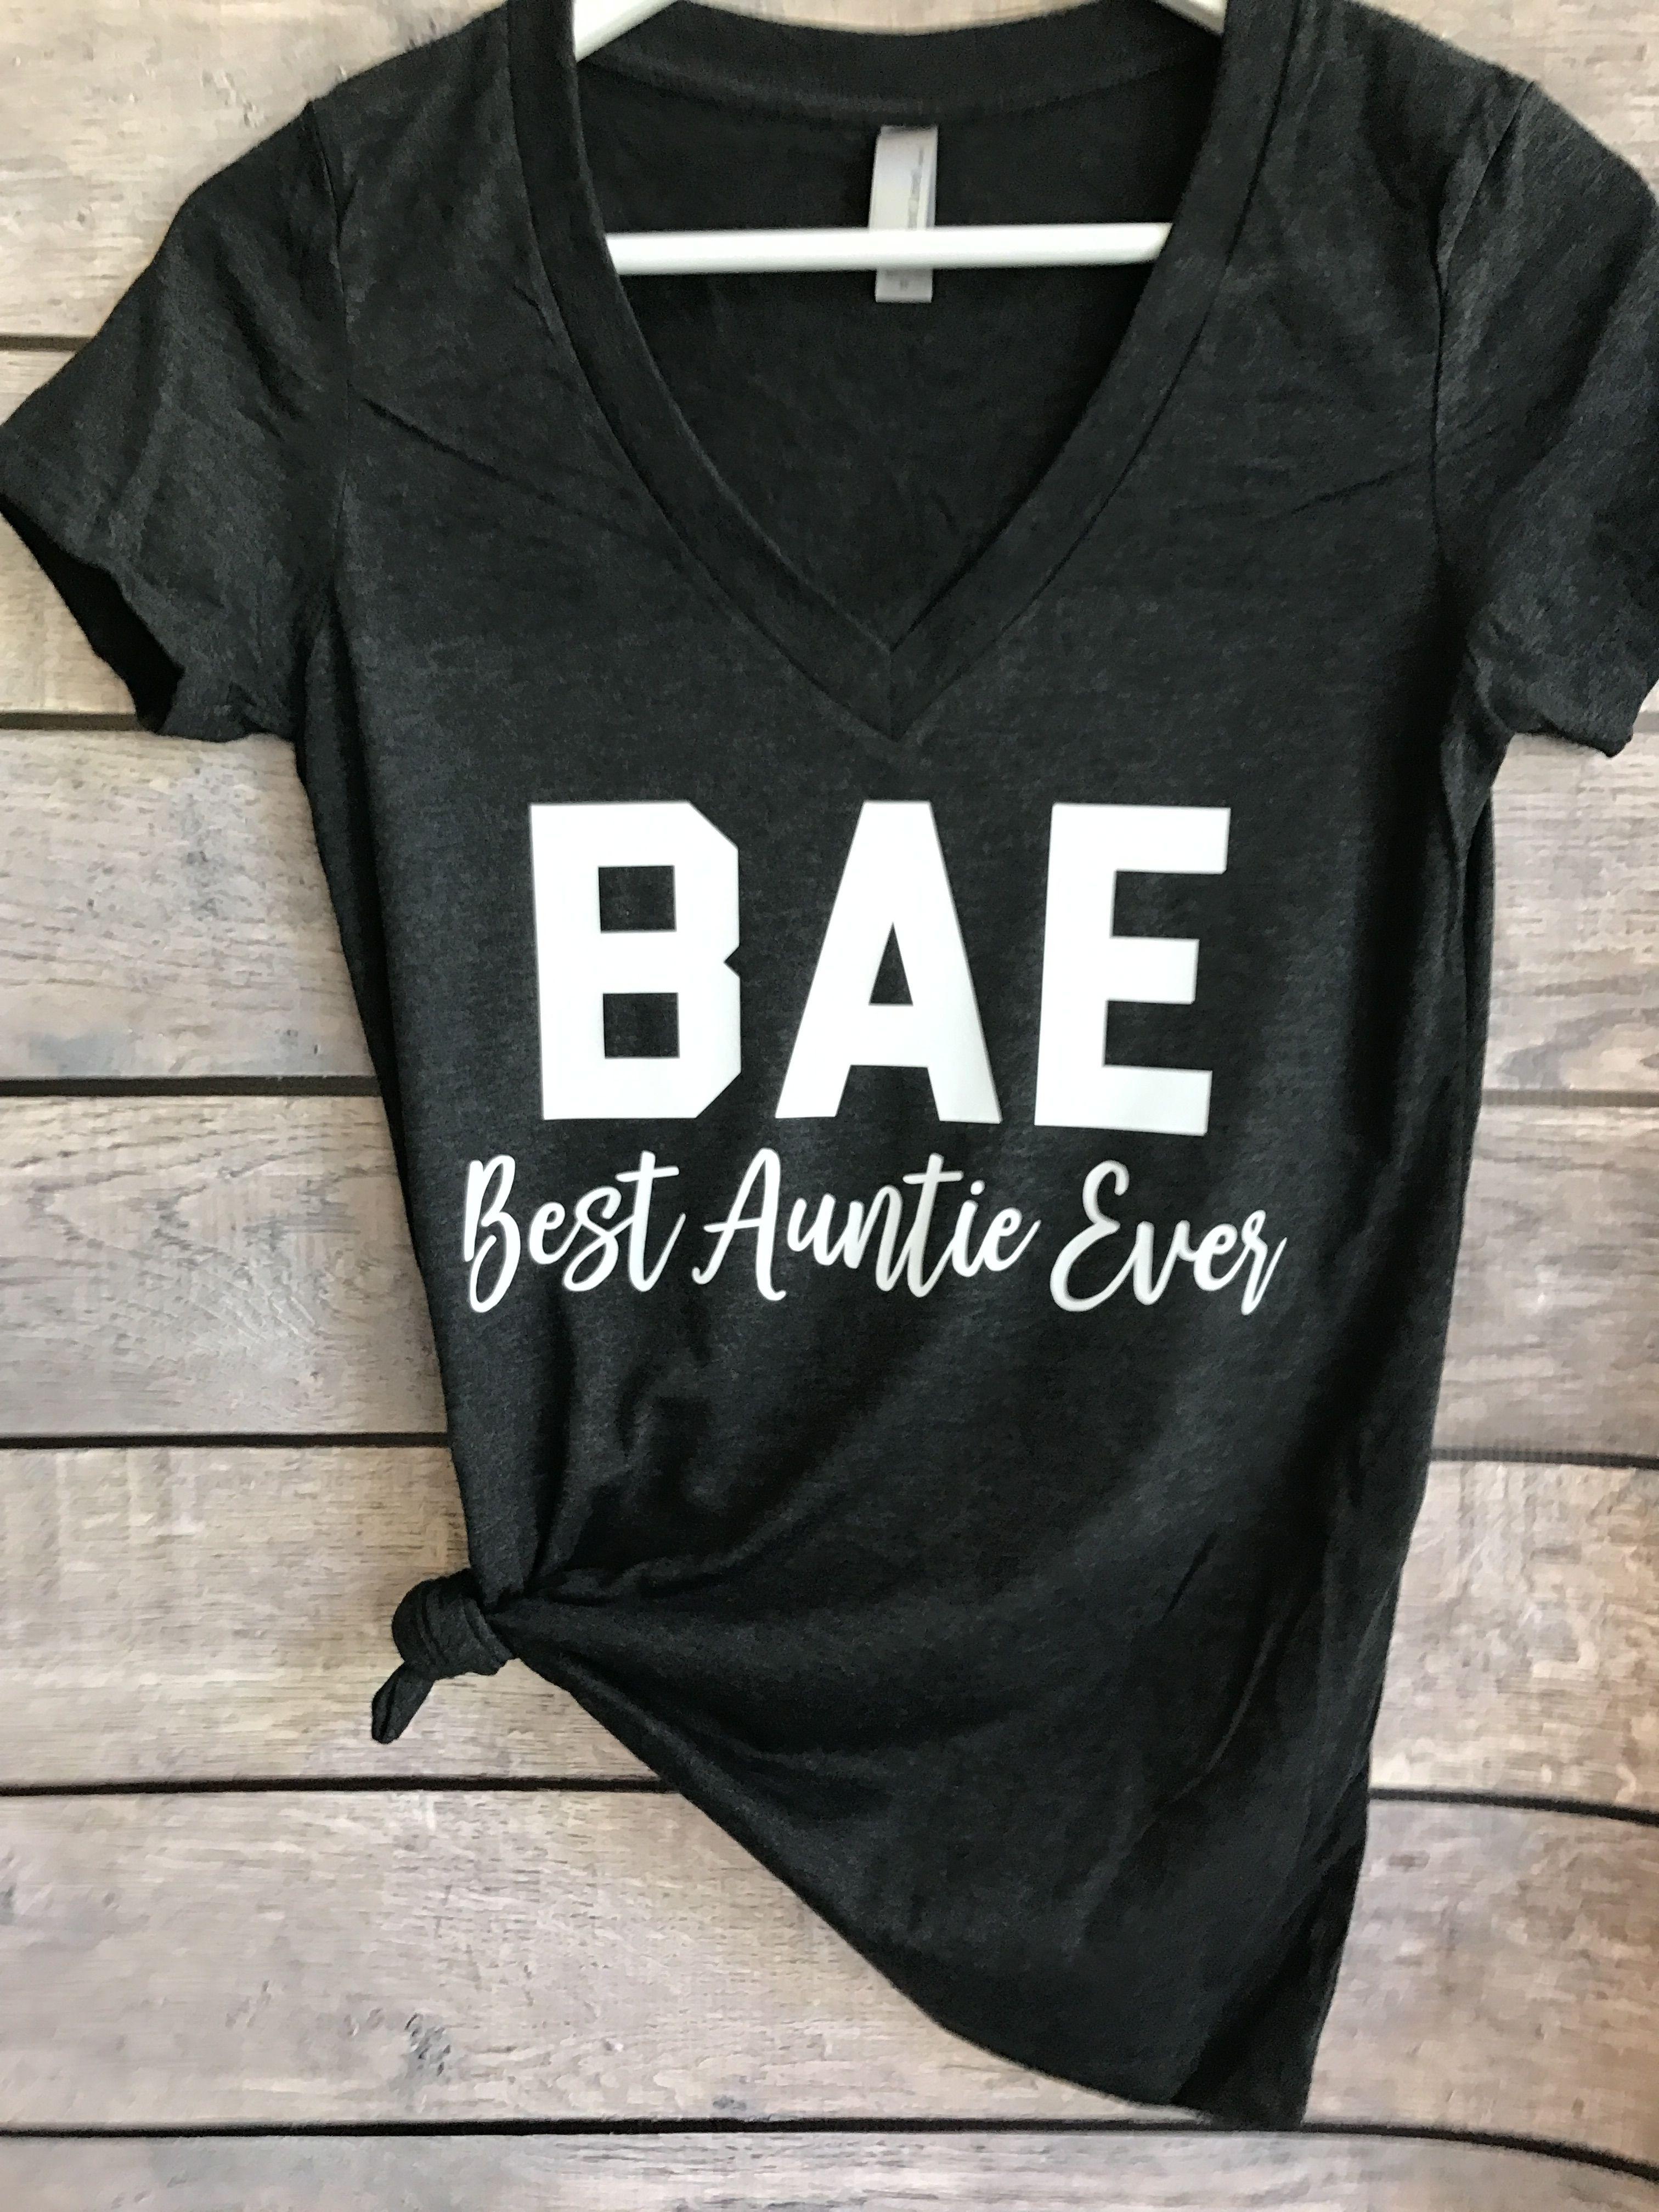 25a59ff40 BAE Best Auntie Ever (V-Neck) Pretty sure Talon said I needed this ...